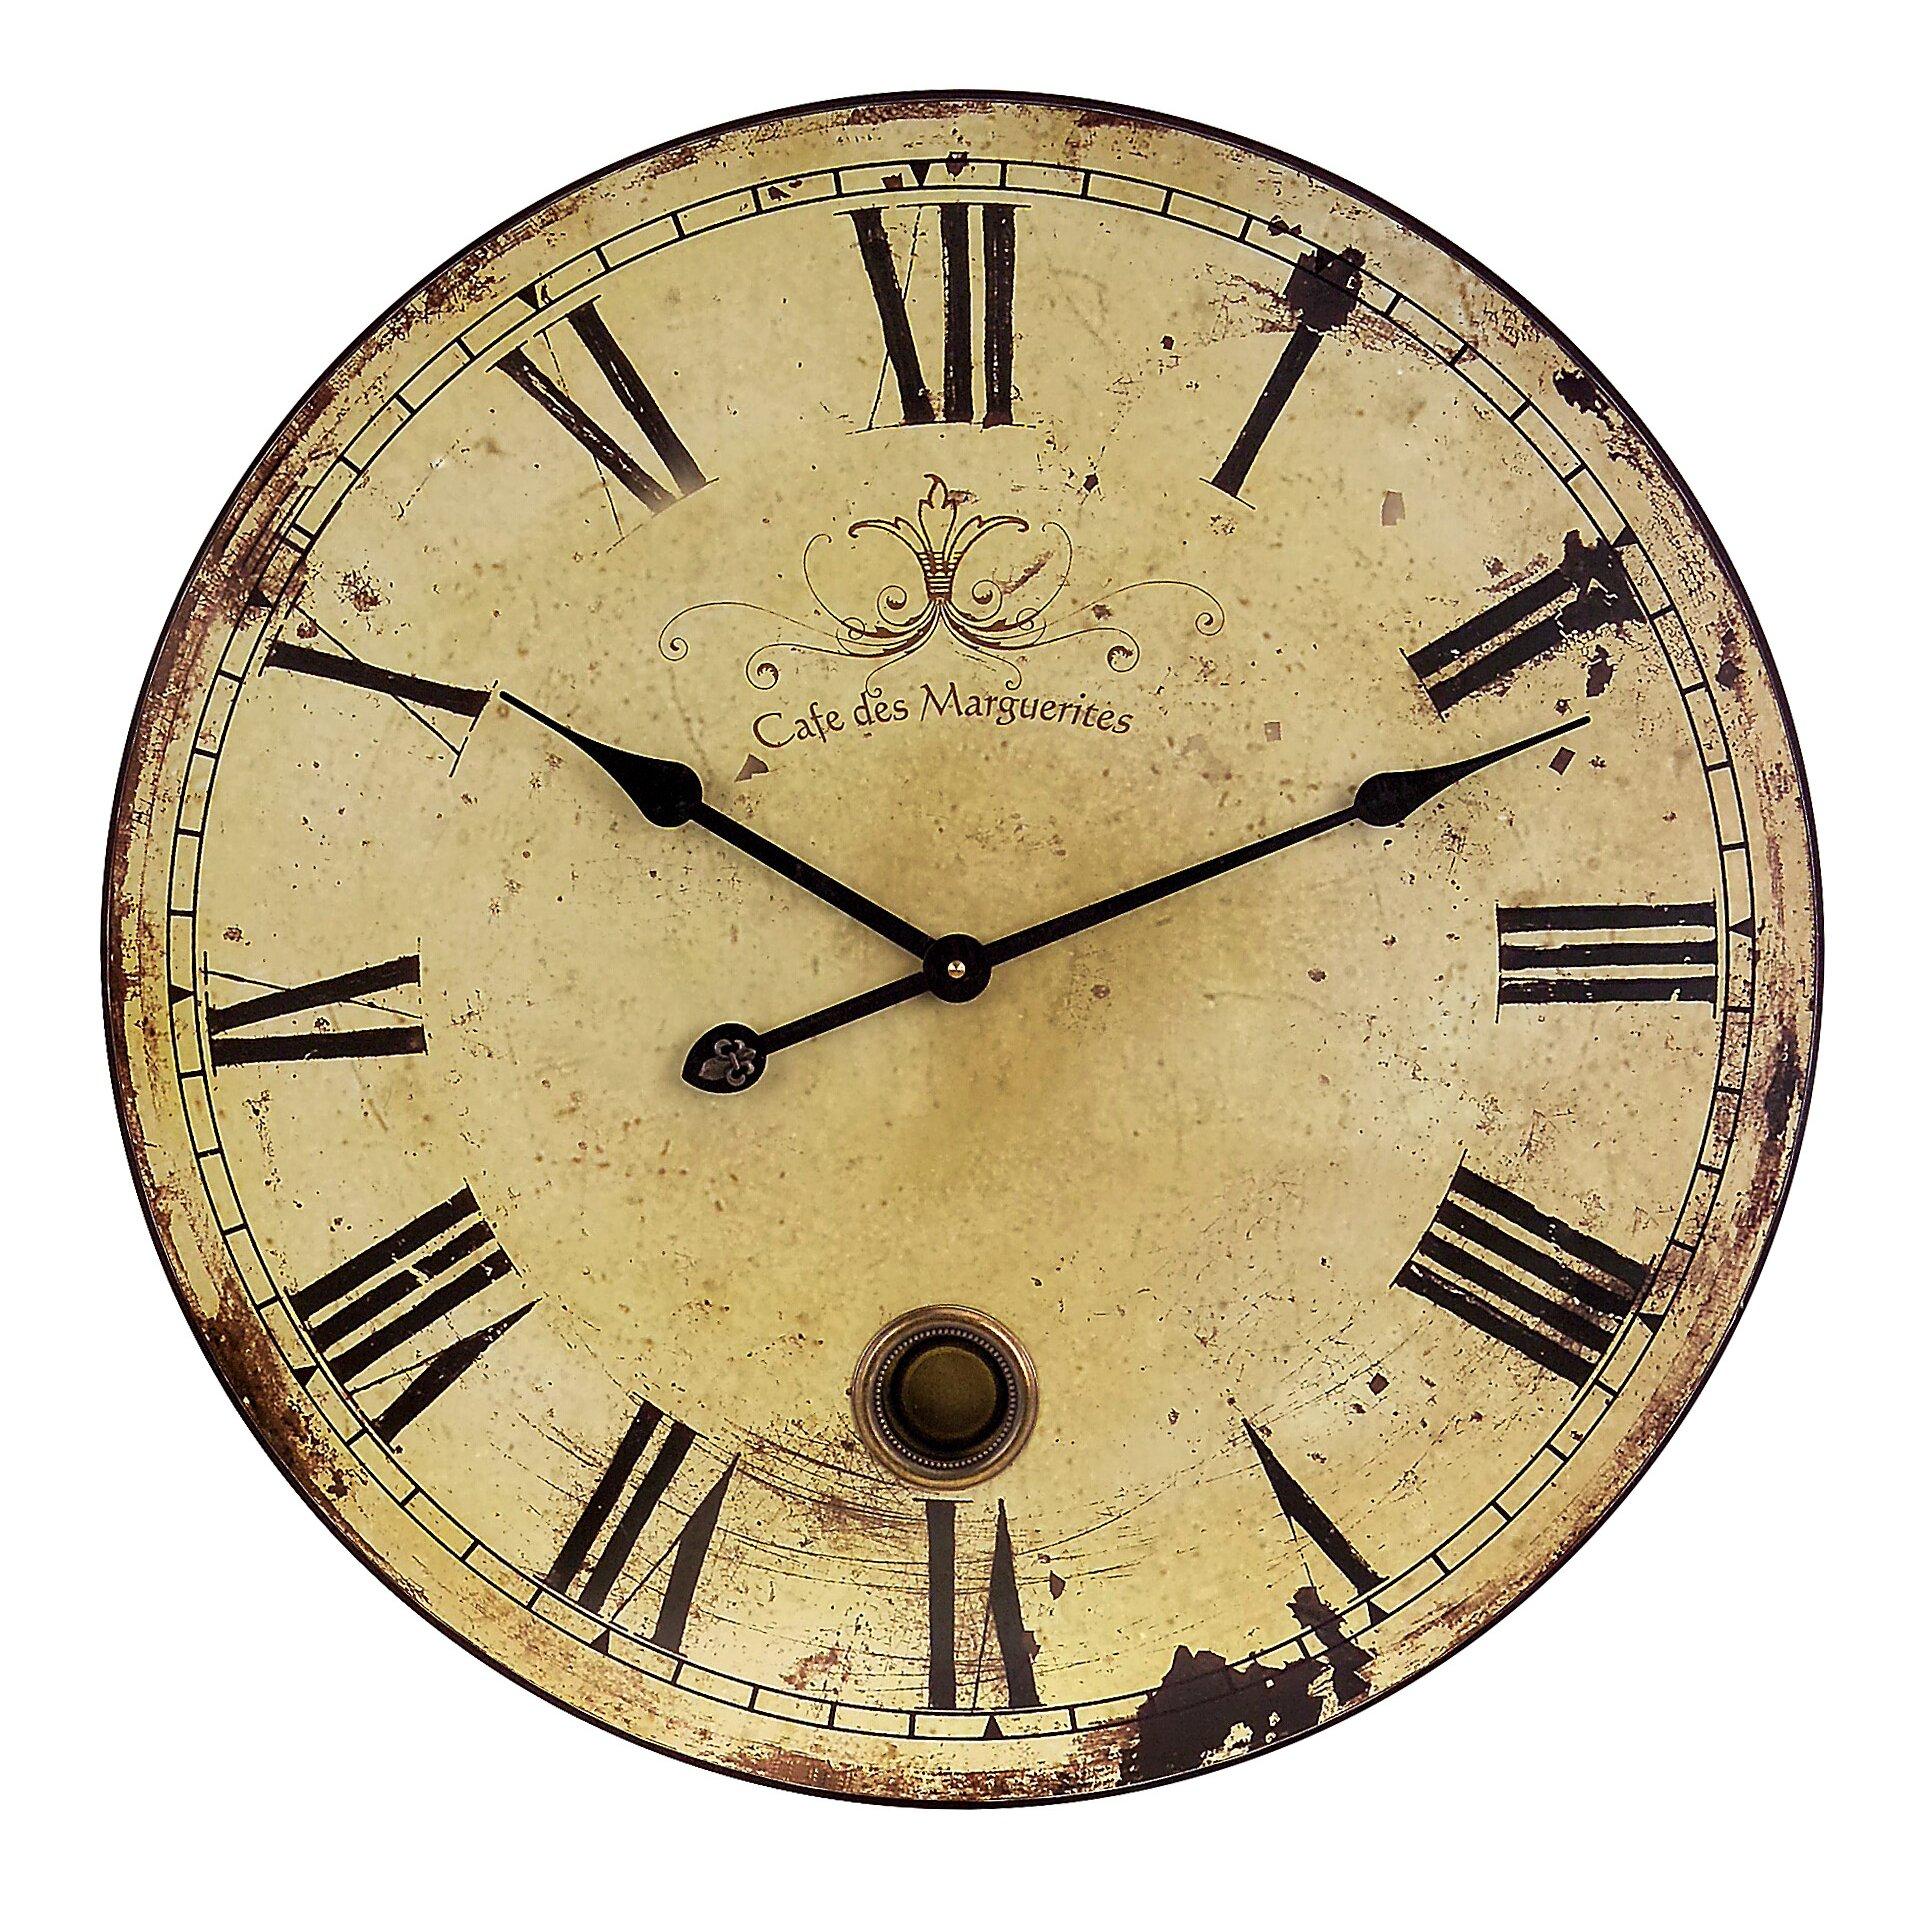 Kitchen Wall Clocks Modern Wall Clocks Youll Love Wayfair